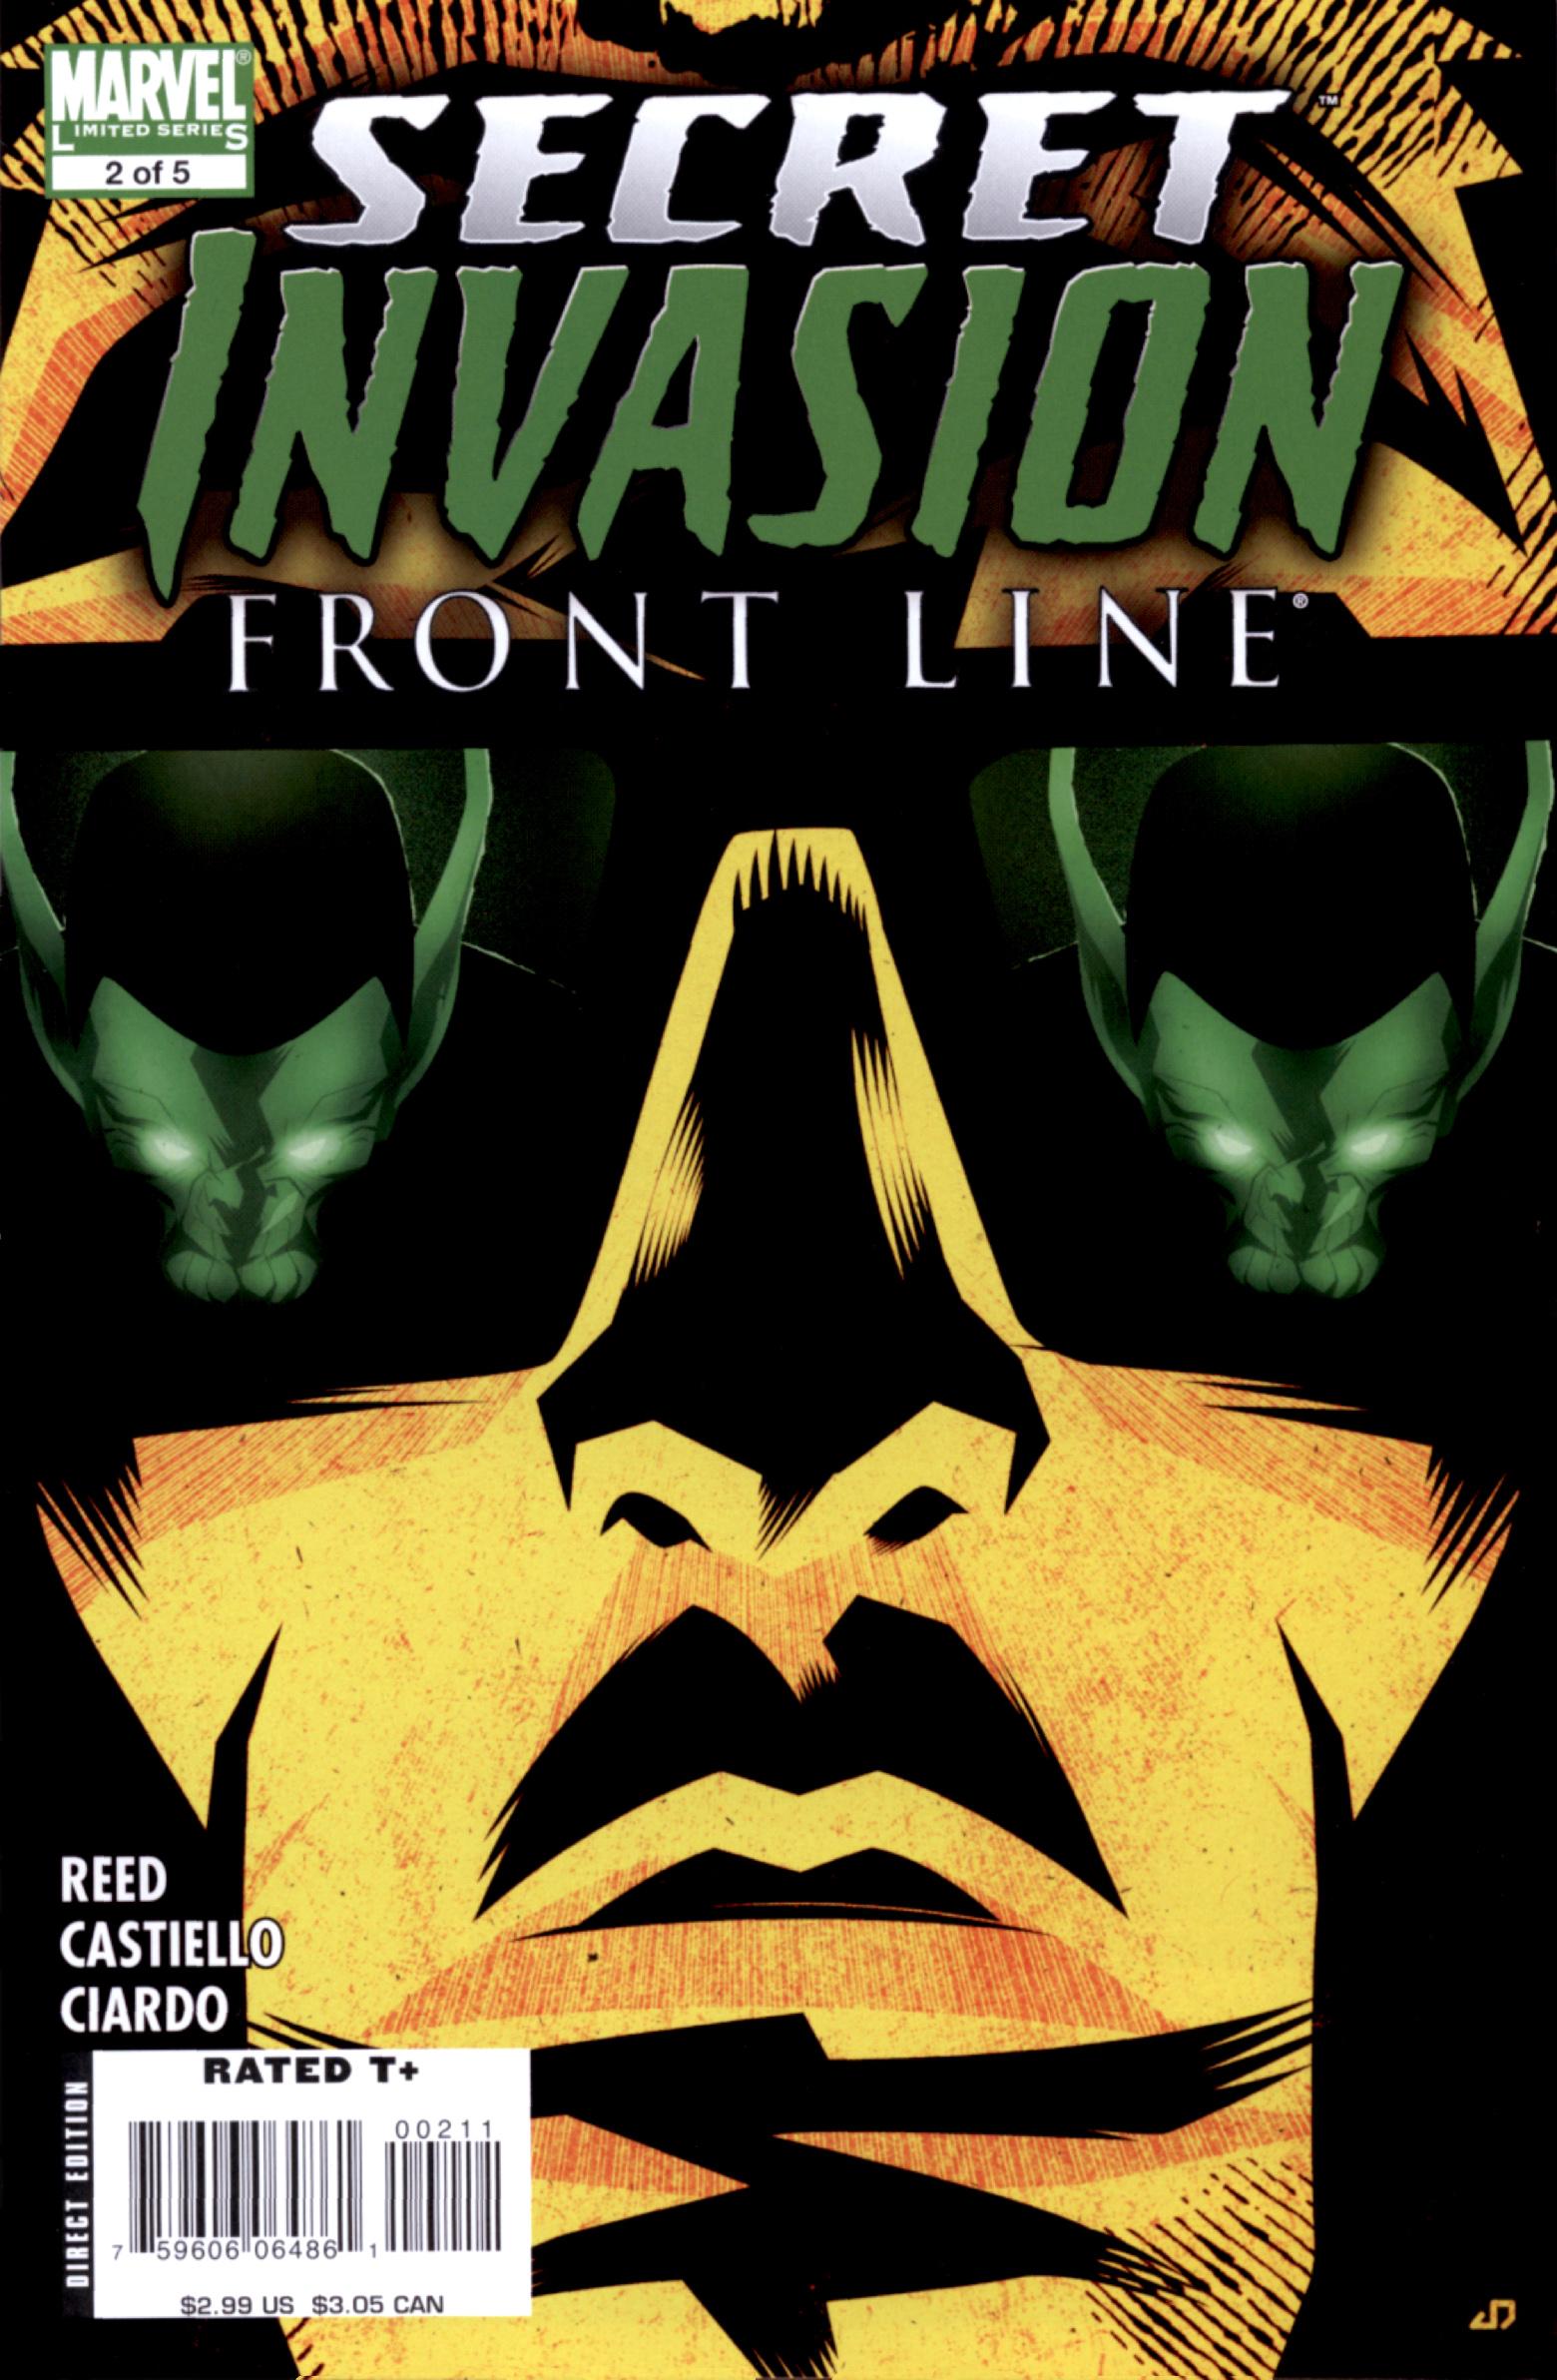 Read online Secret Invasion: Front Line comic -  Issue #2 - 1